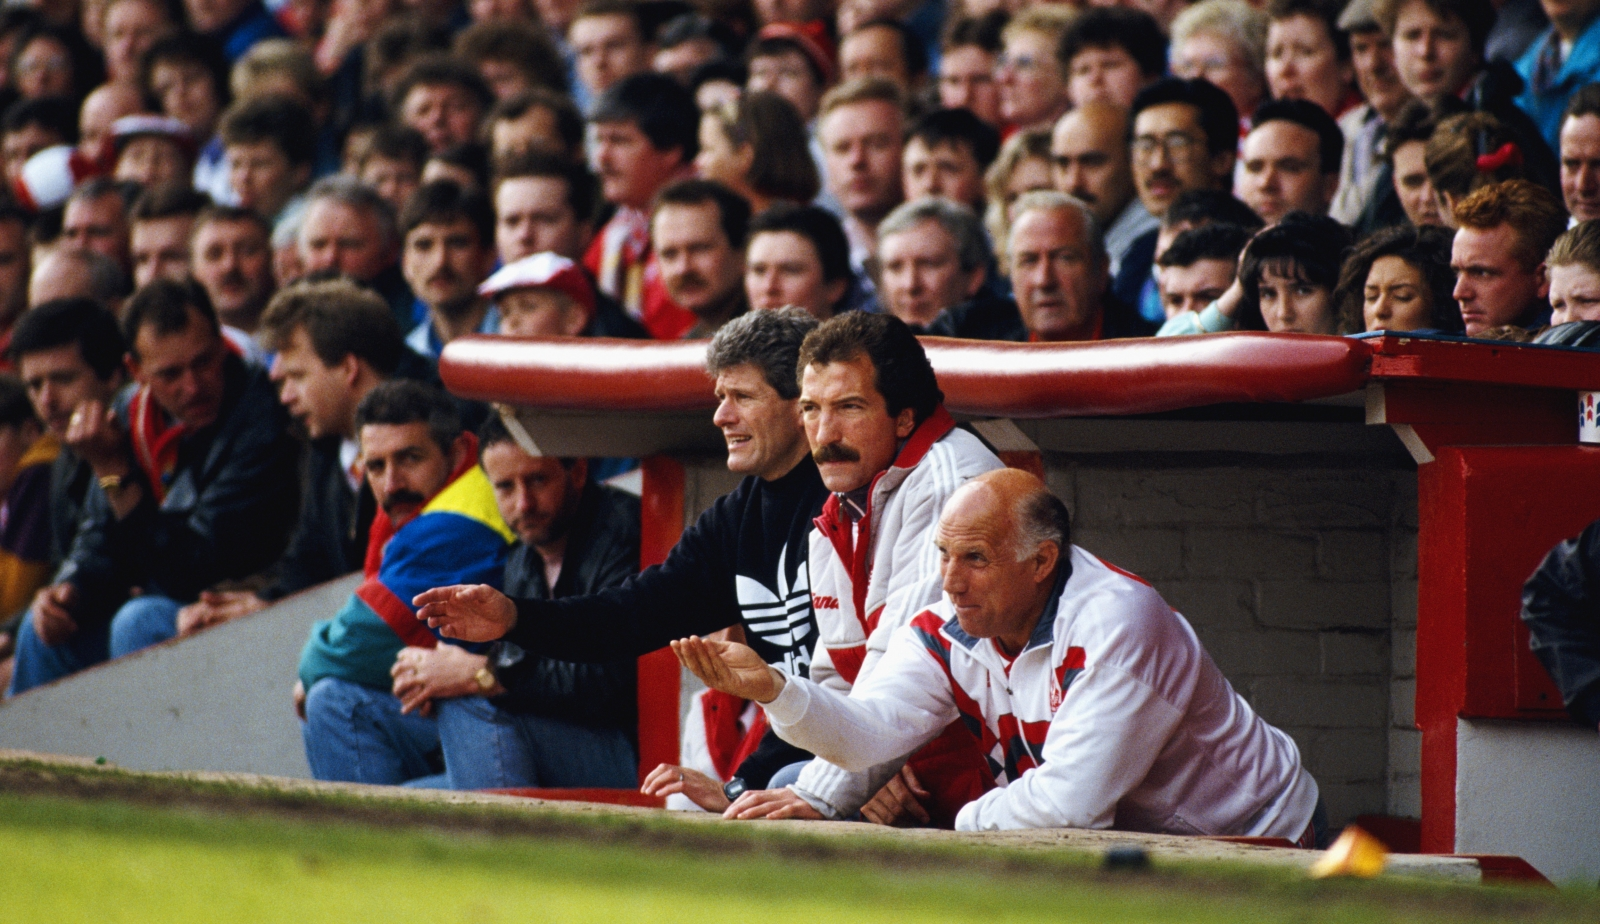 Graeme Souness and Ronnie Moran